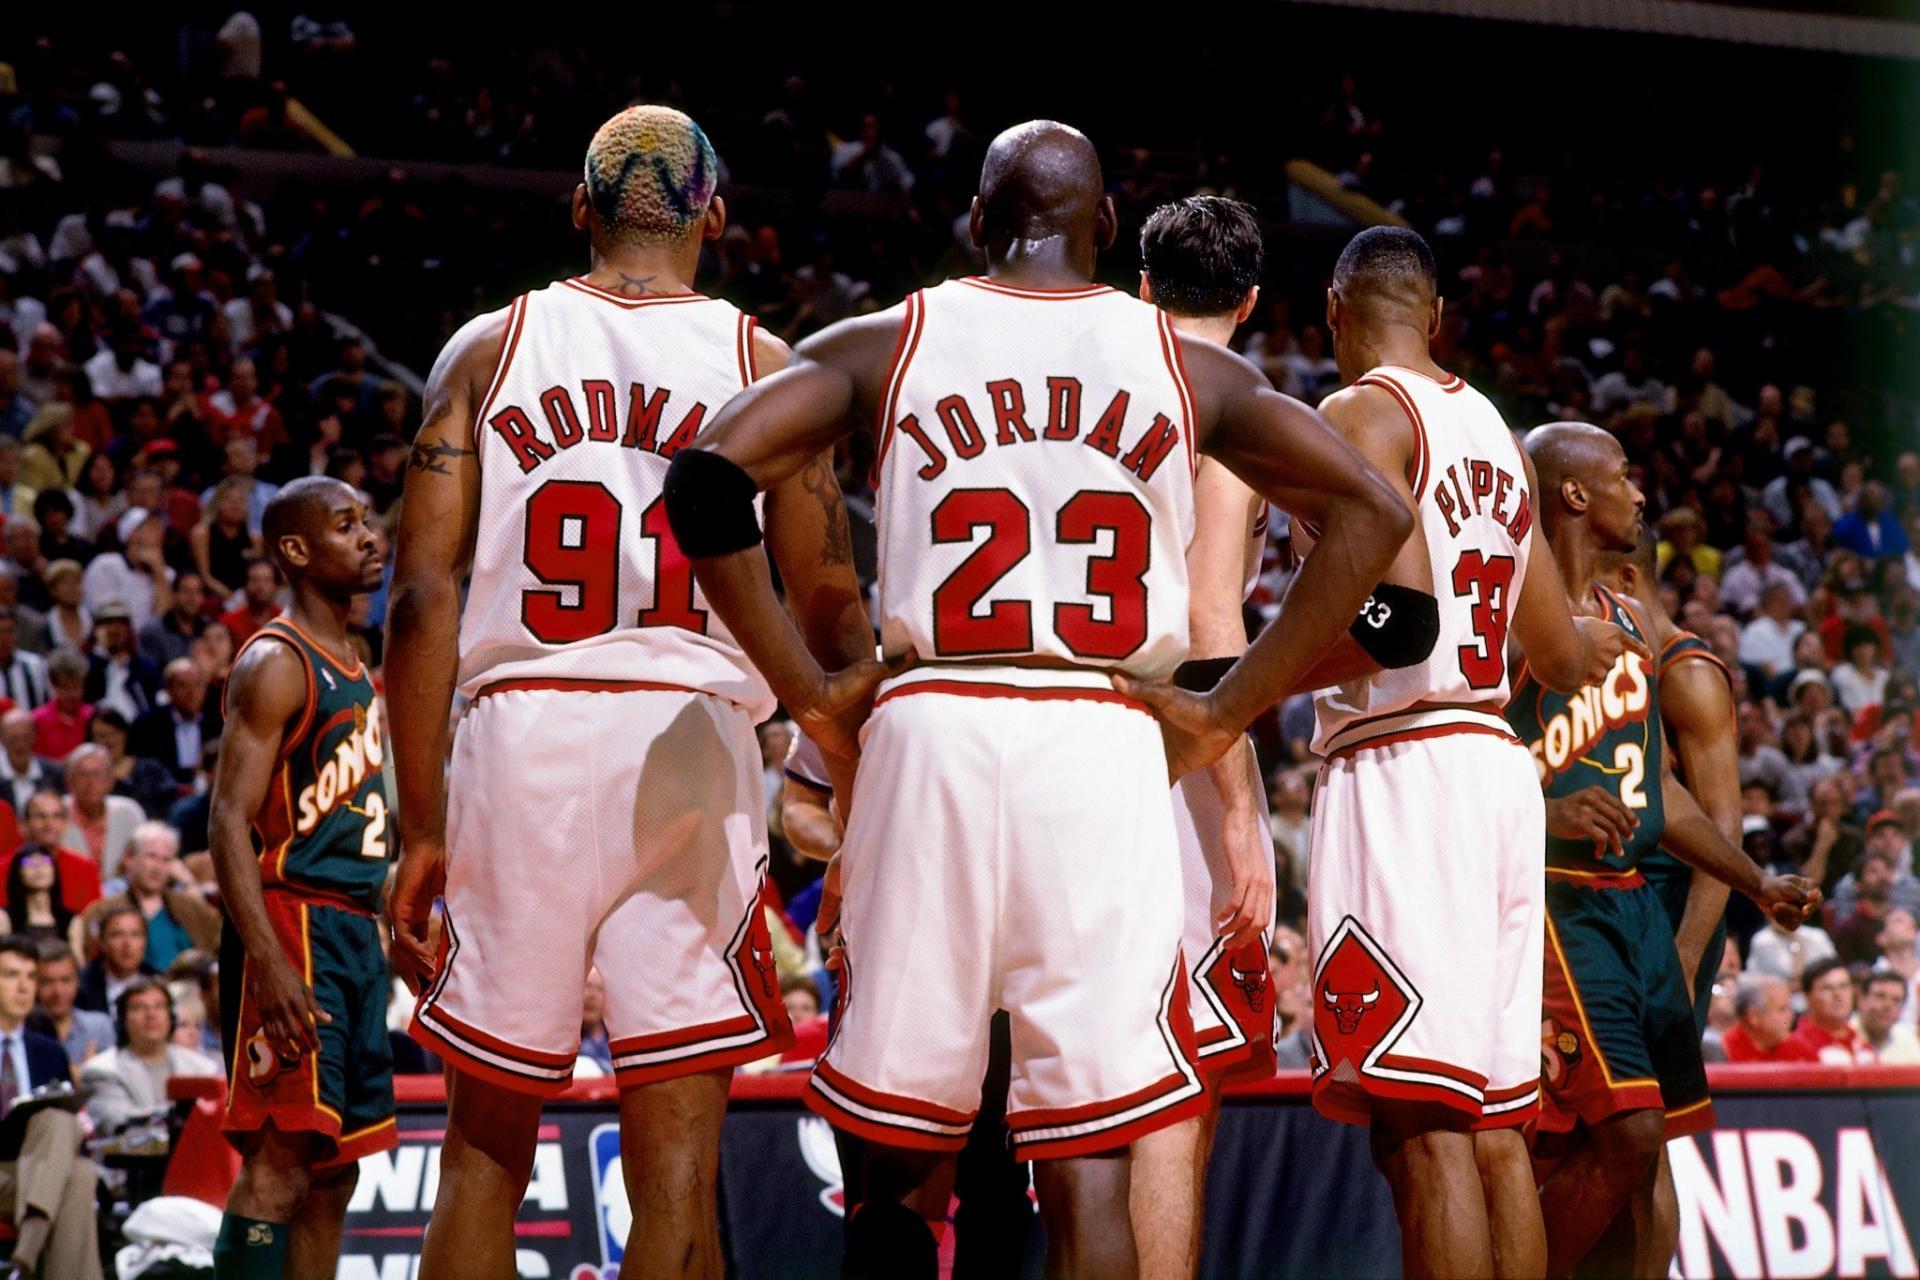 10-players-nba-went-bankruptcy-deset-igraca-koji-su-bankrotirali-sport-dugovi-iverson-sprewell-rodman-pippen-jordan-rick-mahorn